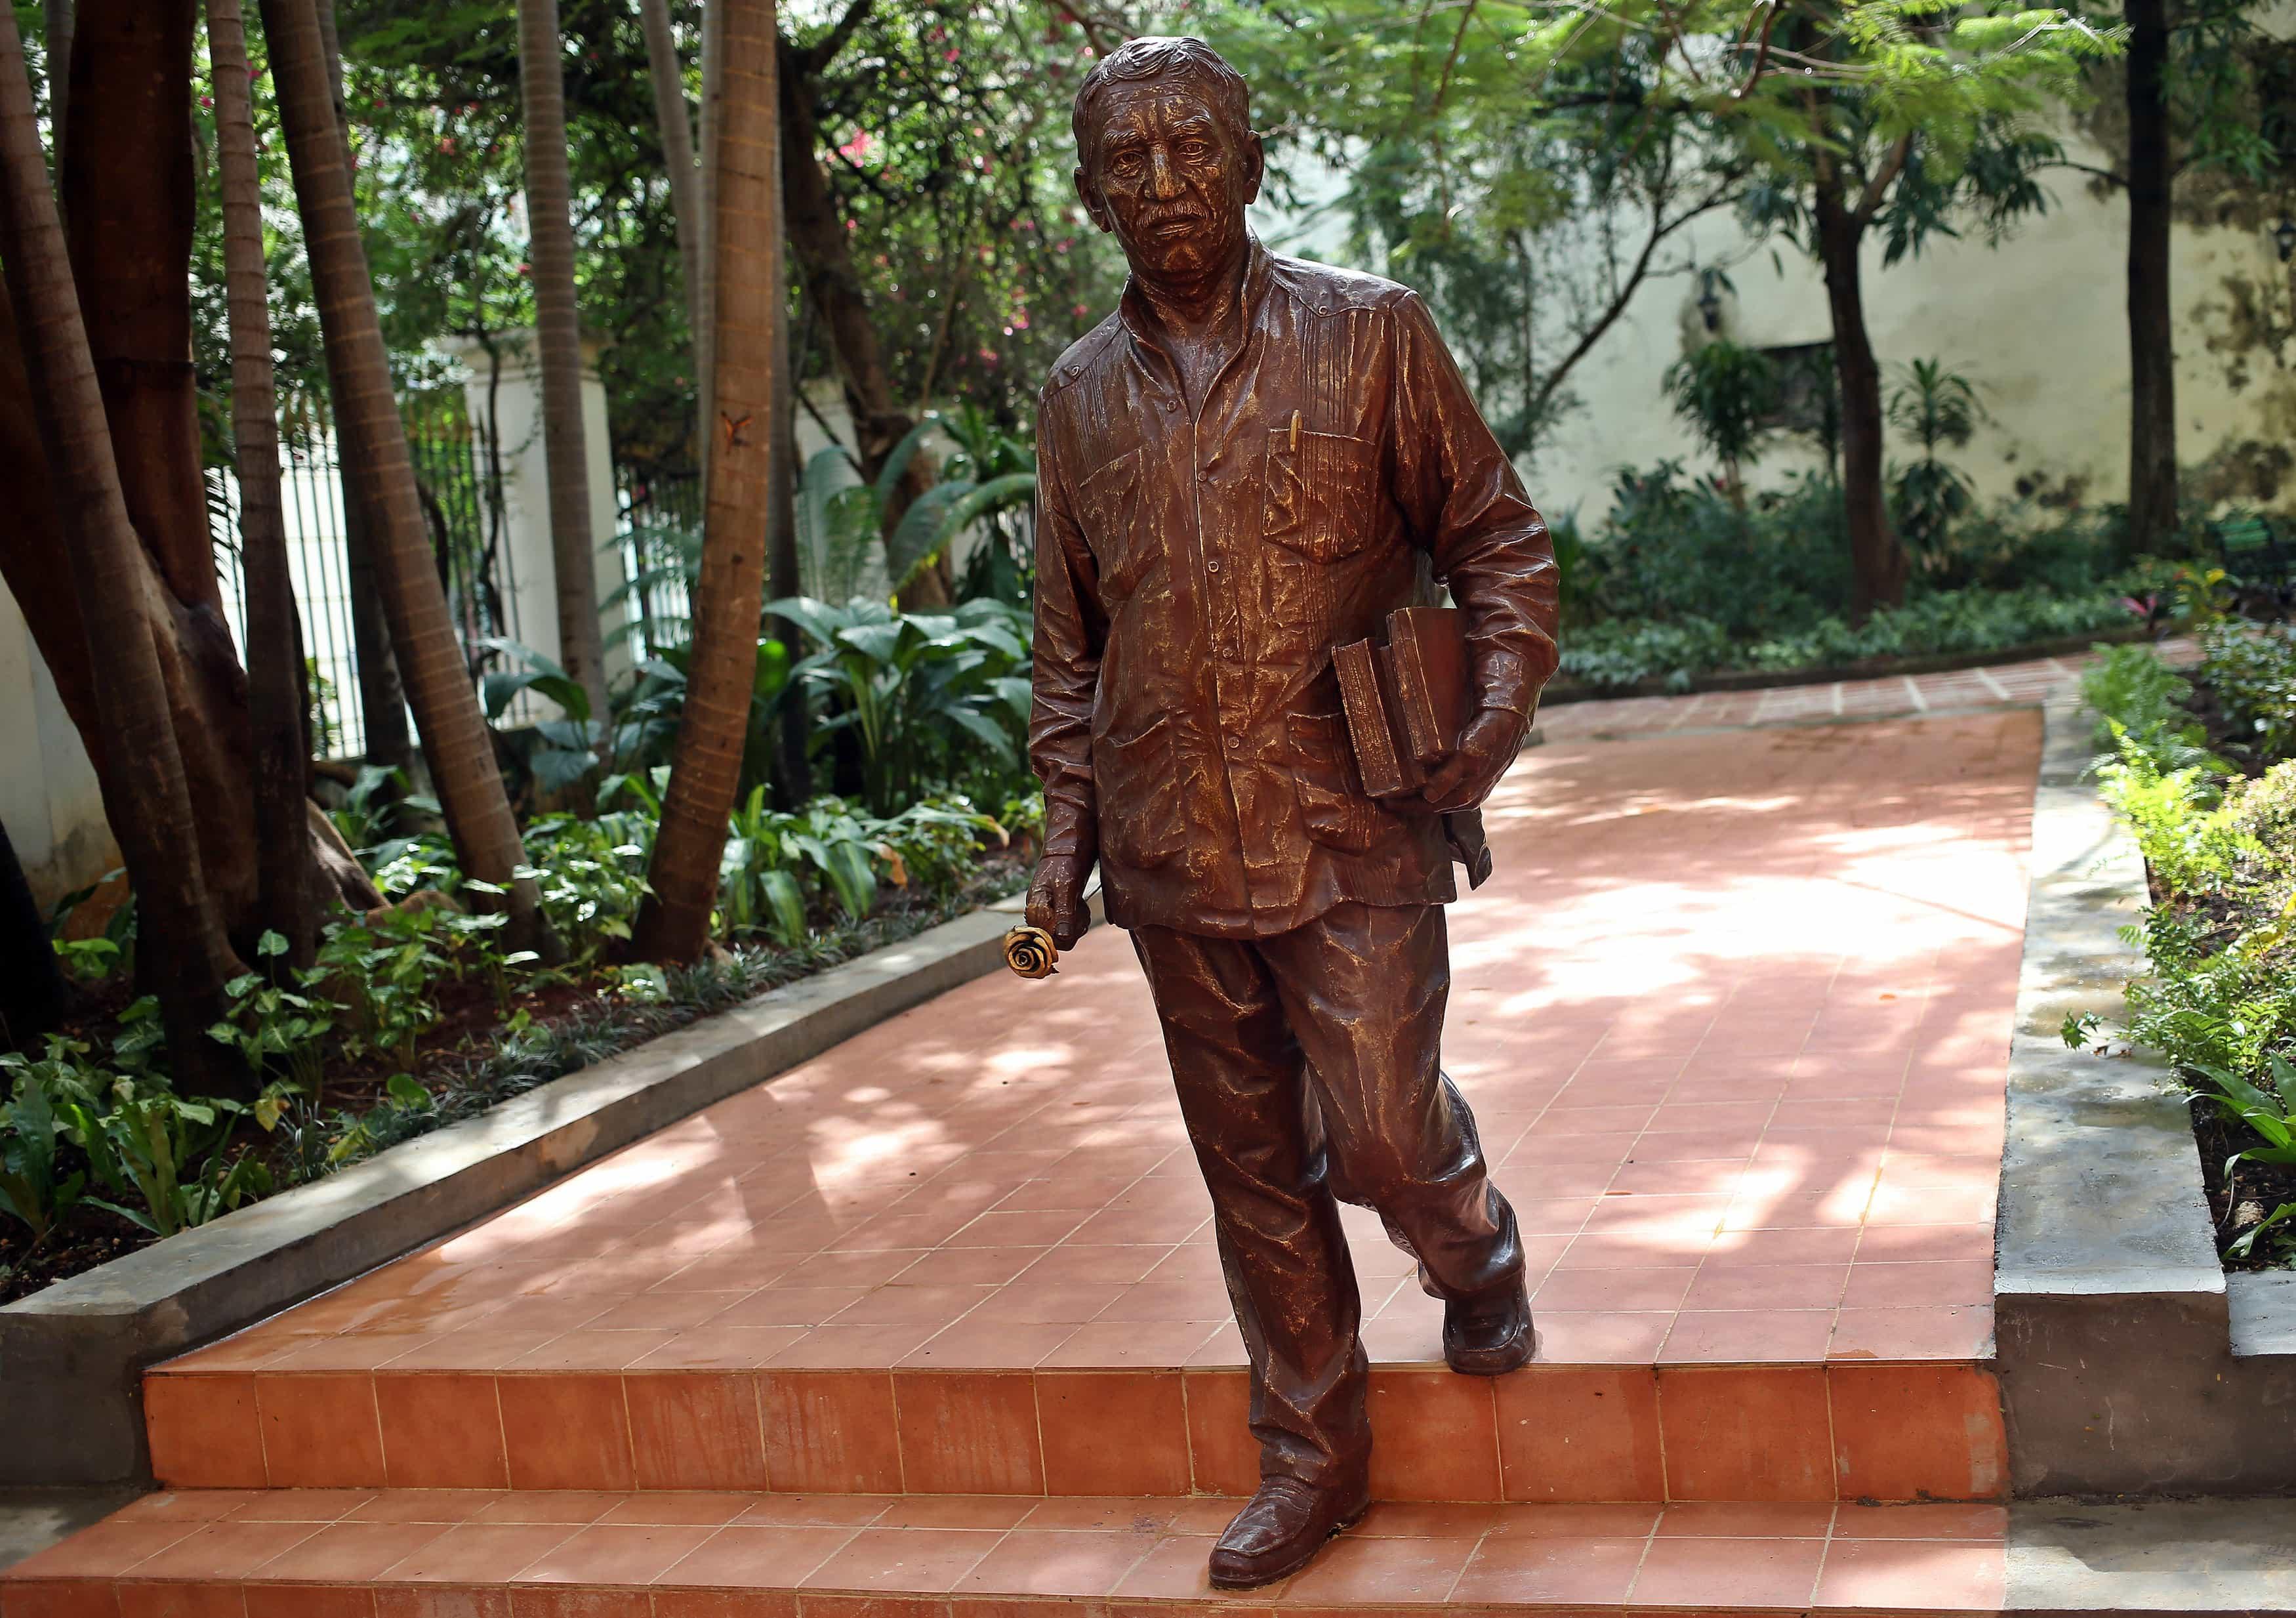 DESVELAN ESCULTURA DE GABRIEL GARCÍA MÁRQUEZ EN CUBA